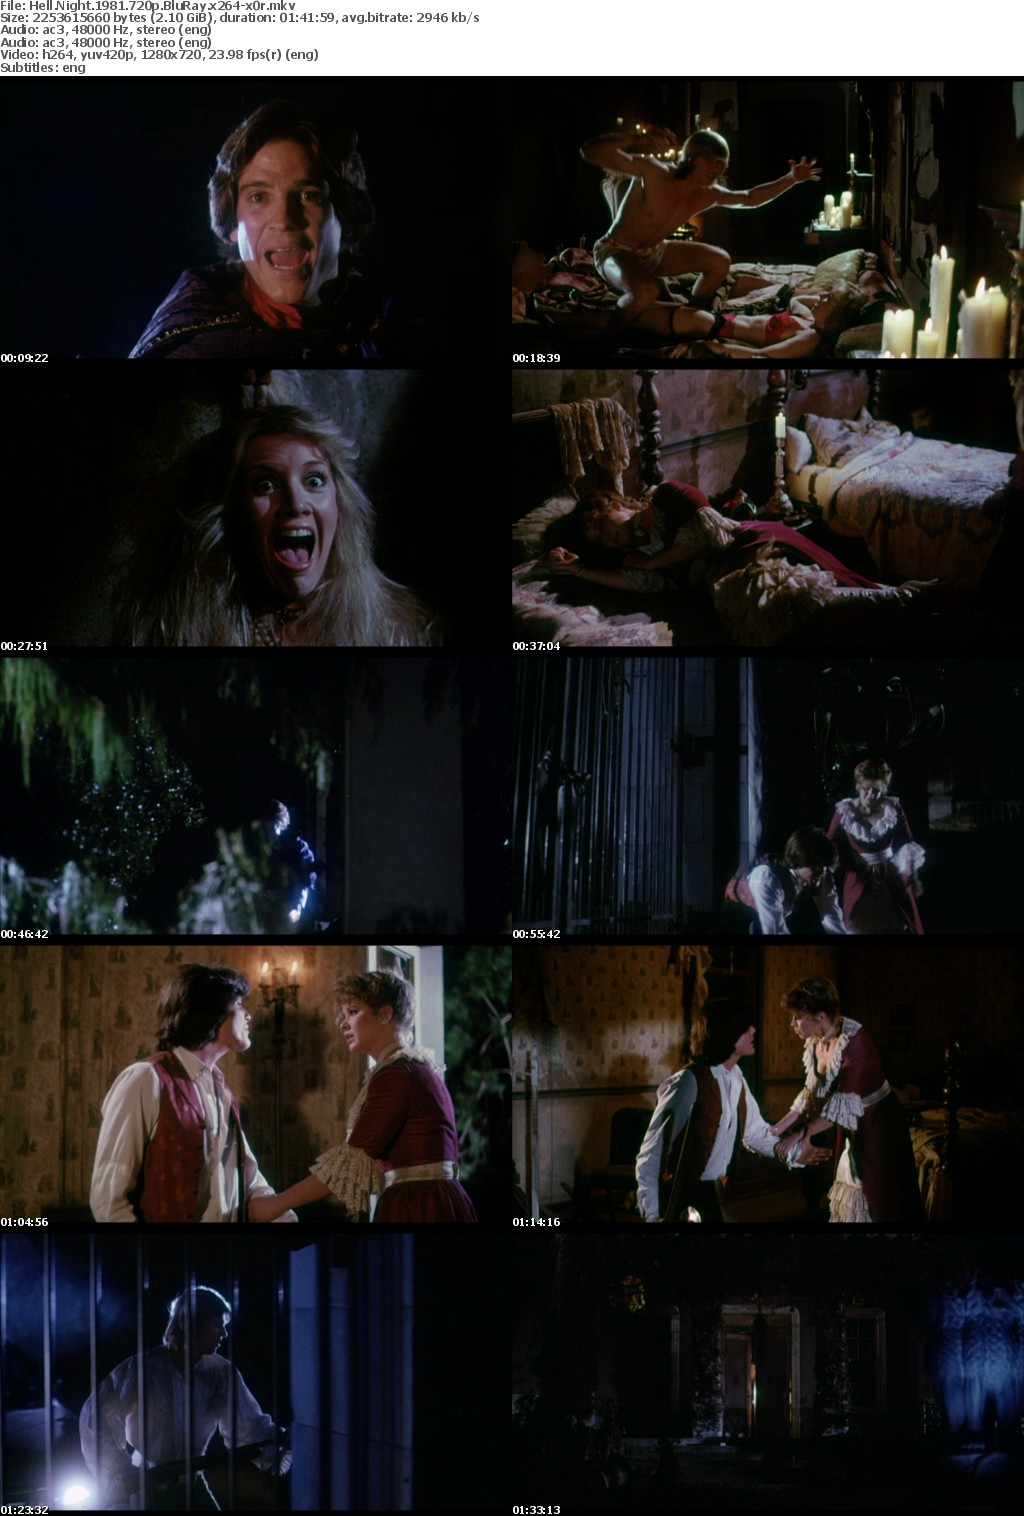 Hell Night 1981 720p BluRay x264-x0r